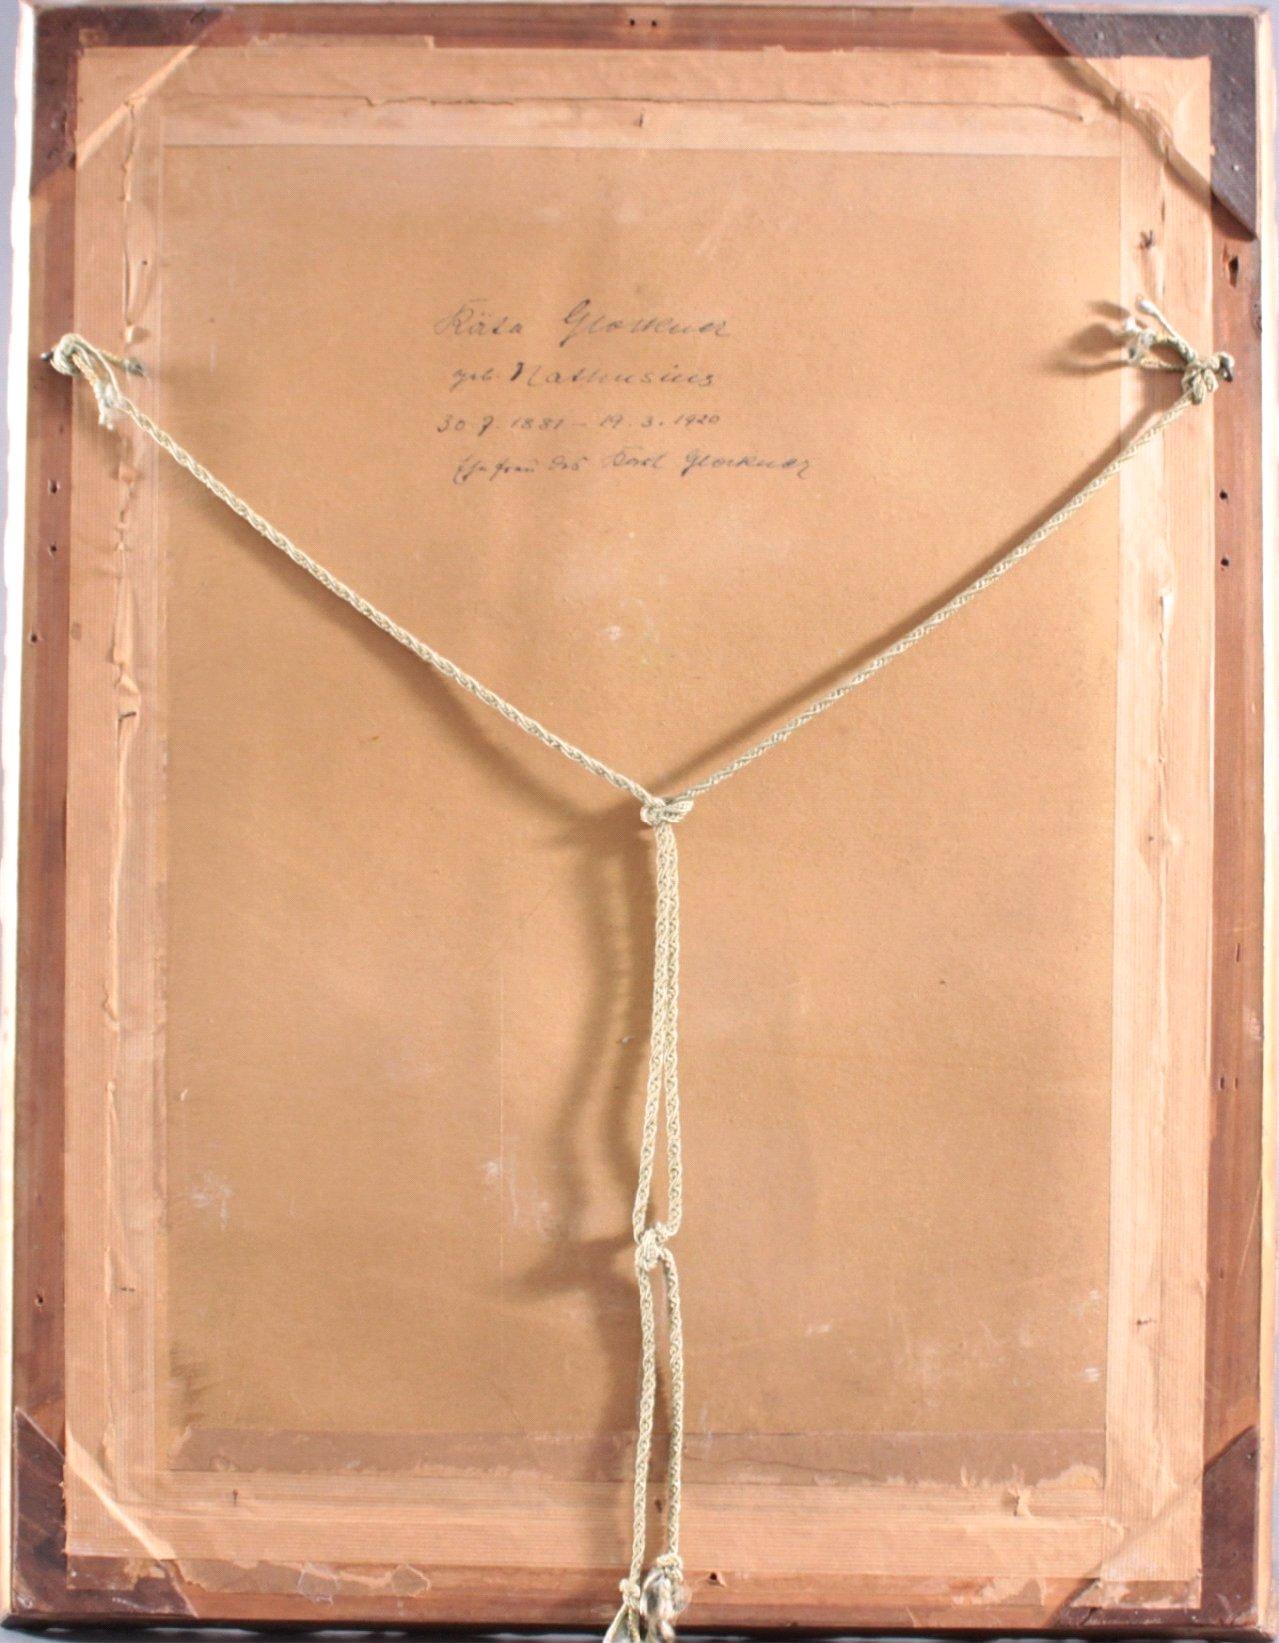 Damenbildnis des 19. Jahrhundert-3